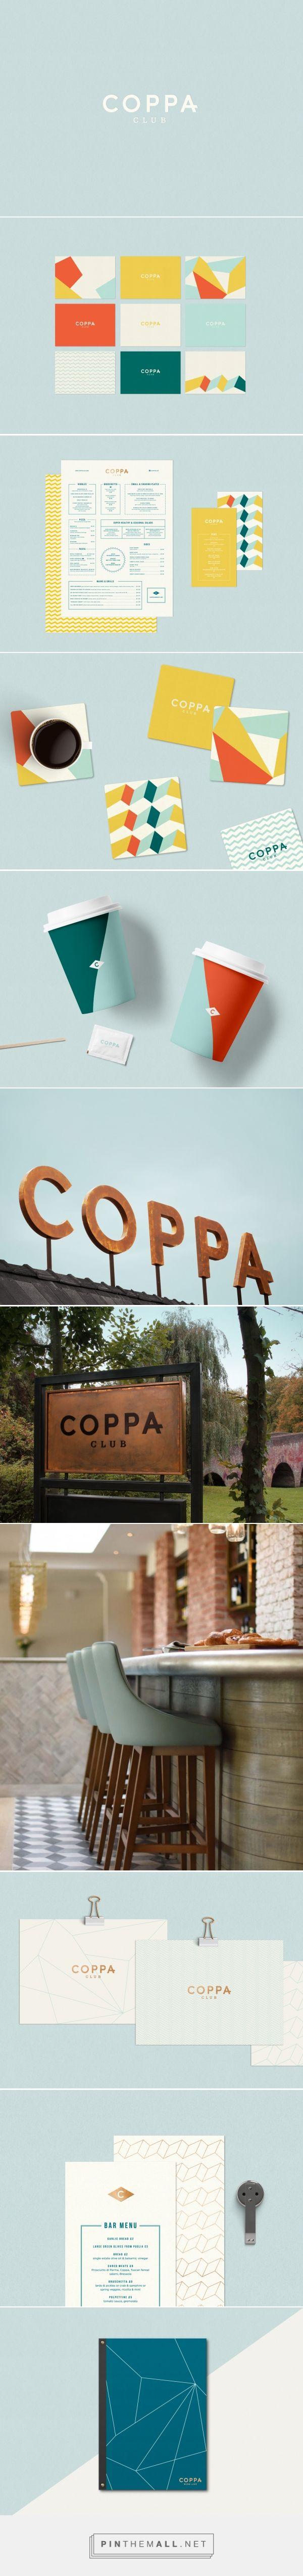 Coppa Club Branding by The Plant  #branding #identity #identidadvisual #diseñografico #malaga #inspiracion#marbella